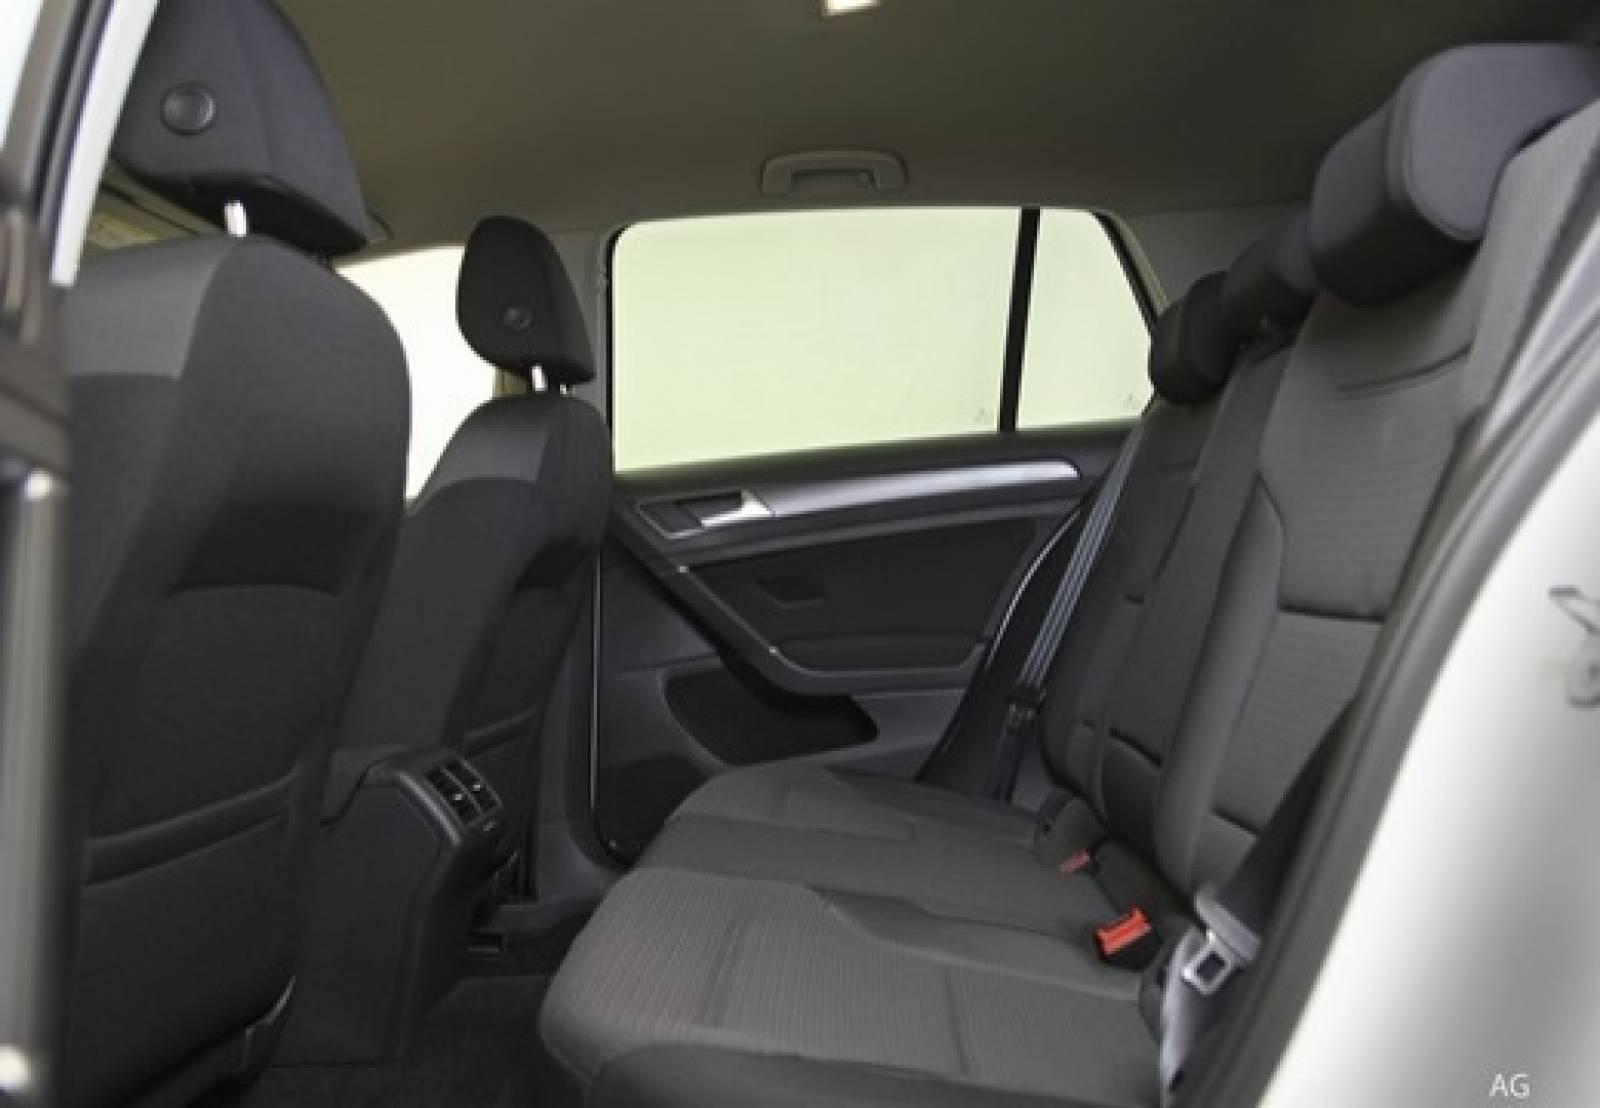 VOLKSWAGEN Golf 1.5 TSI 150 EVO DSG7 - véhicule neuf - LEMAUVIEL AUTOMOBILES - Présentation site web V2 - Lemauviel Automobiles - VIRE - 14500 - VIRE - 8